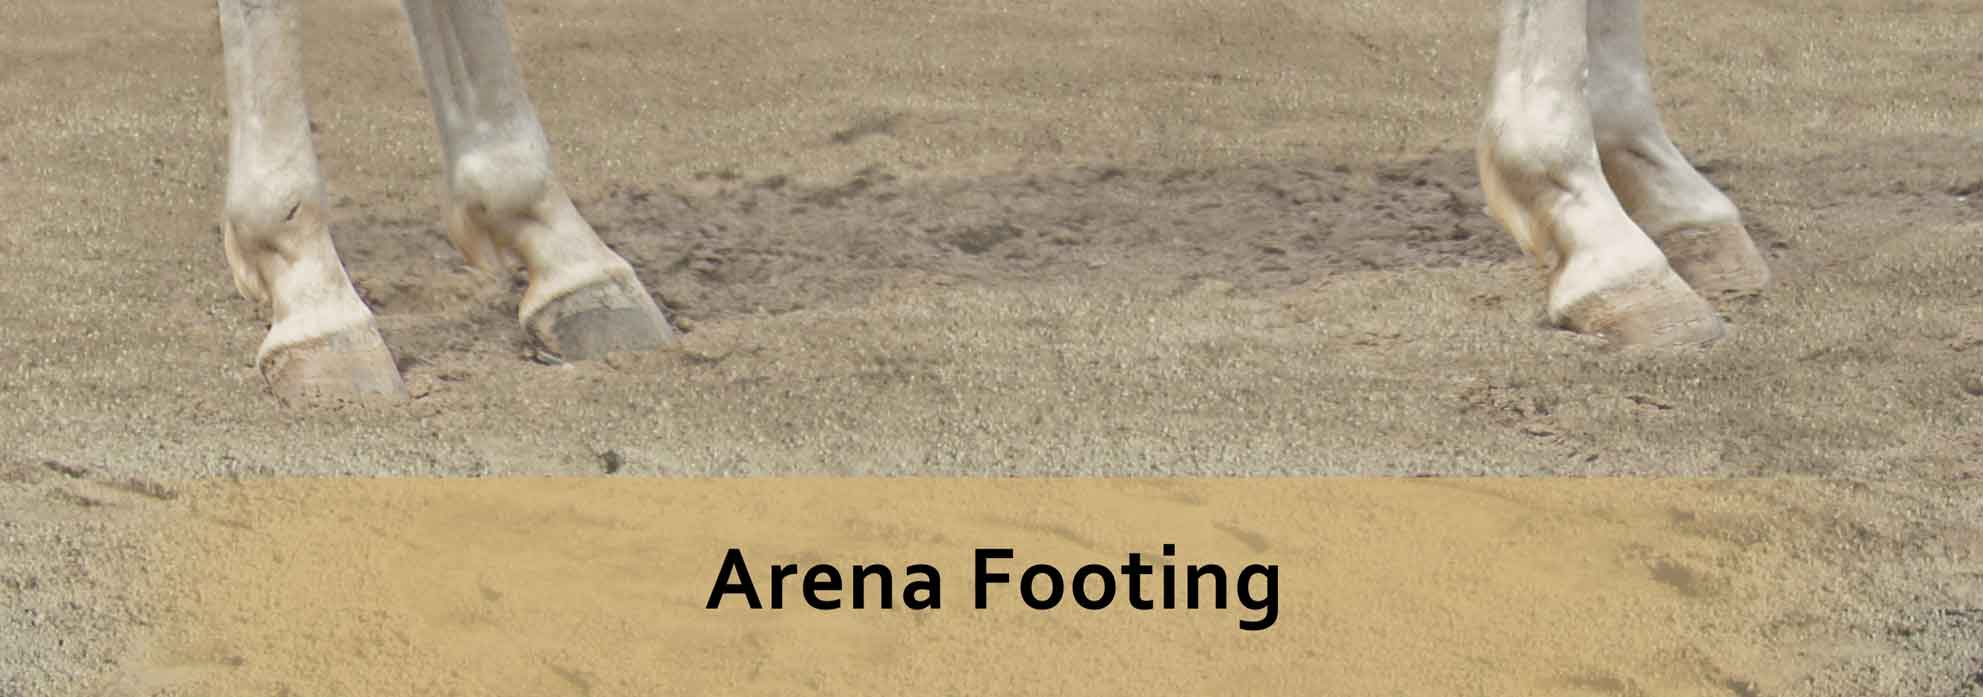 arena footing